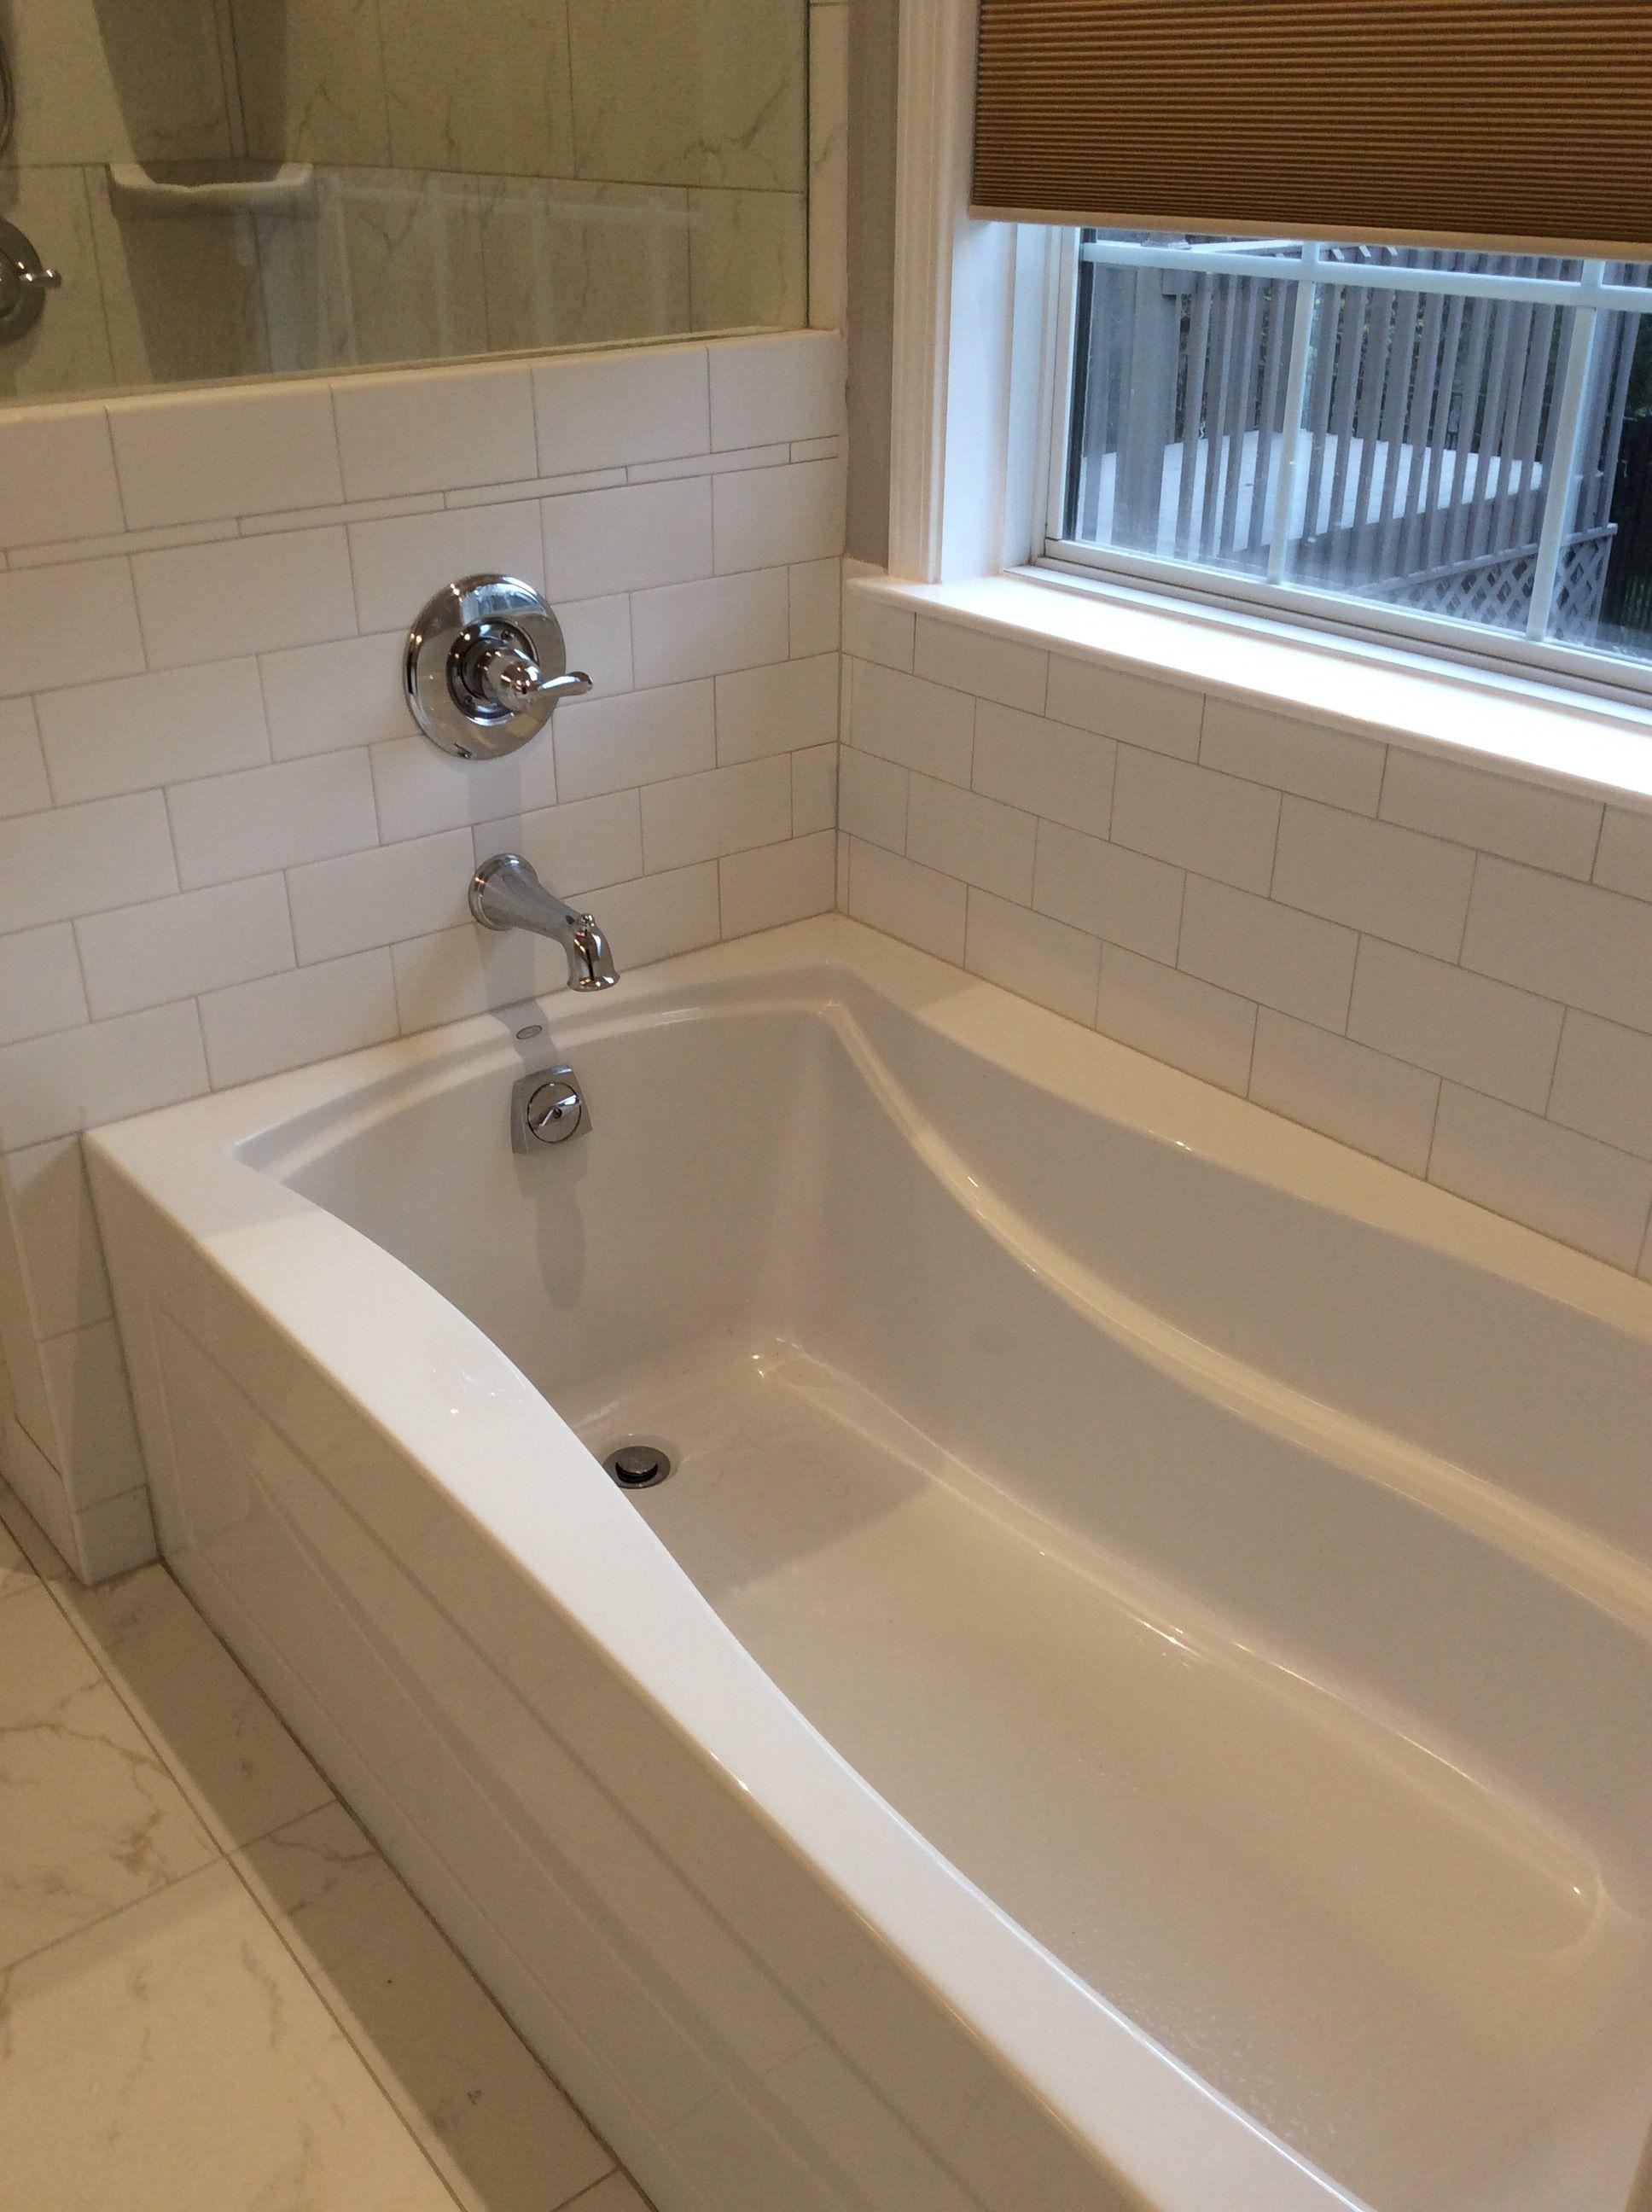 Kohler mariposa soaking tub with white subway tile   Master bathroom ...